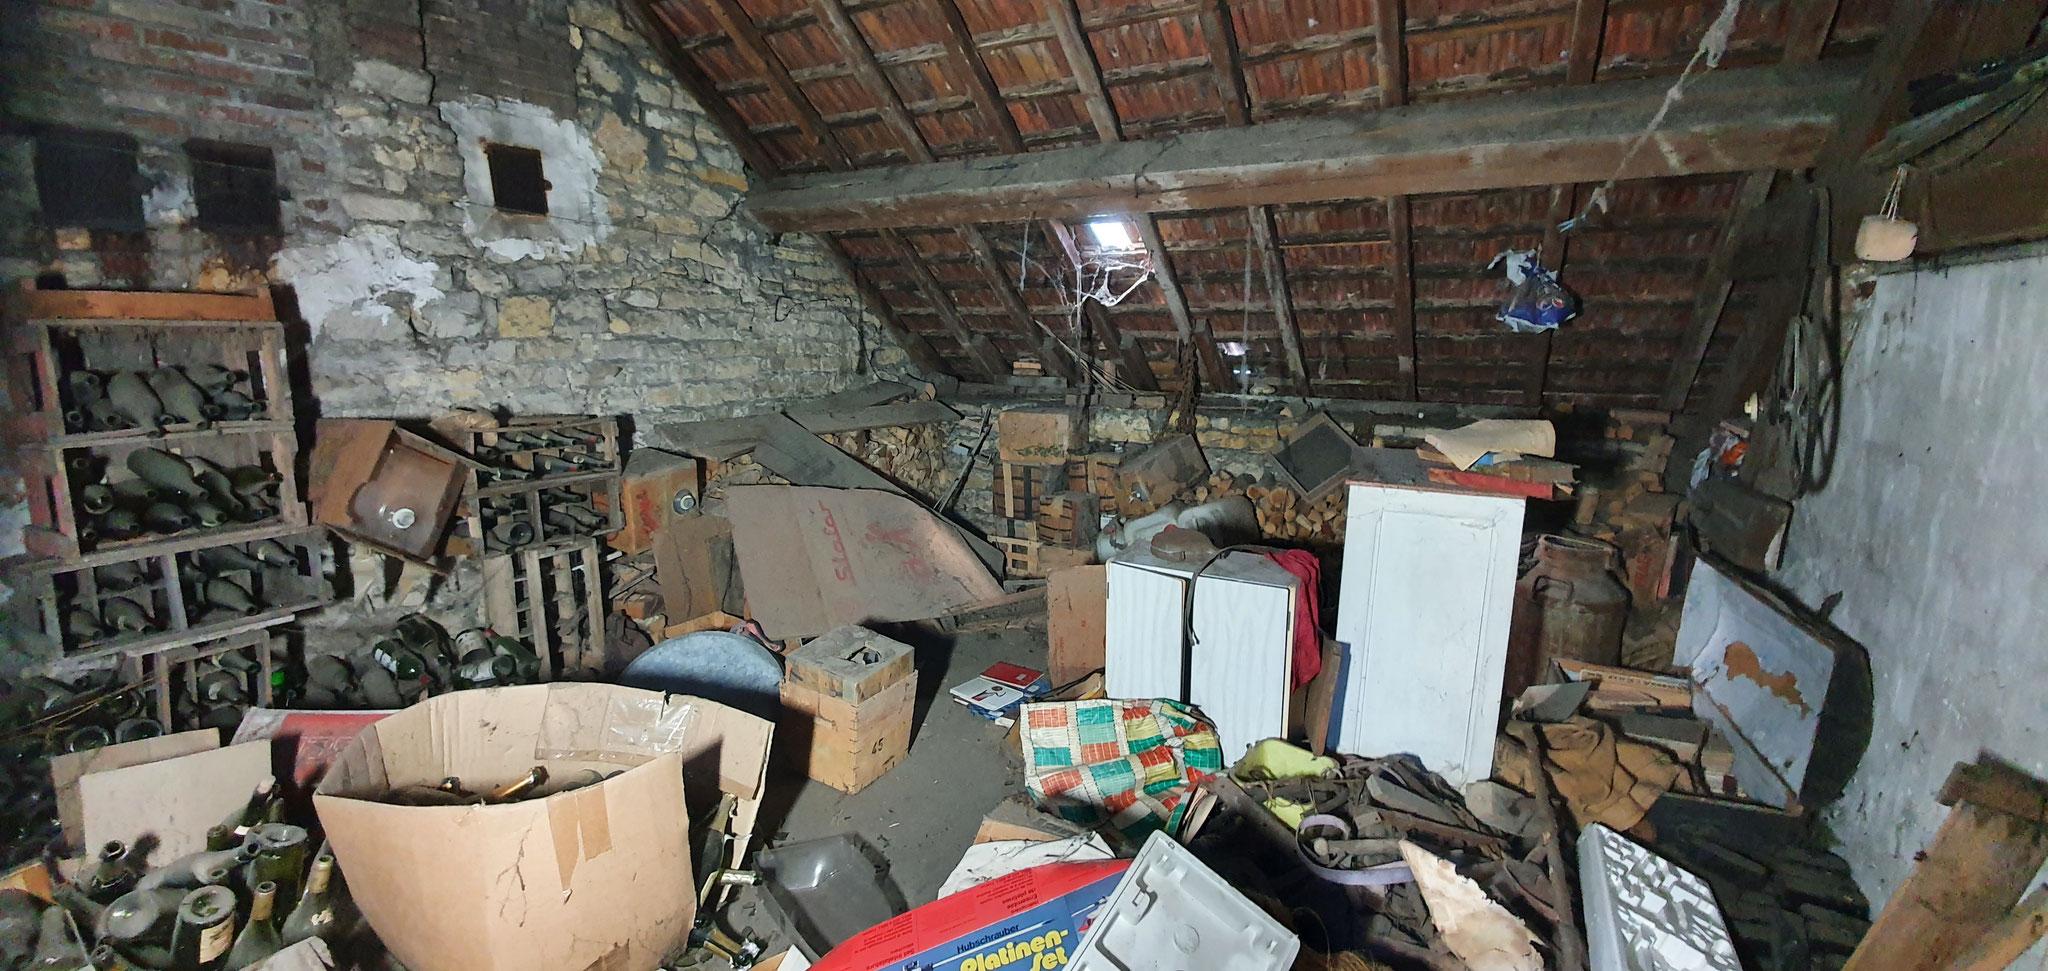 Débarras d'un grenier à Pontarlier 25300 - Doubs - débarras Ahlen clément